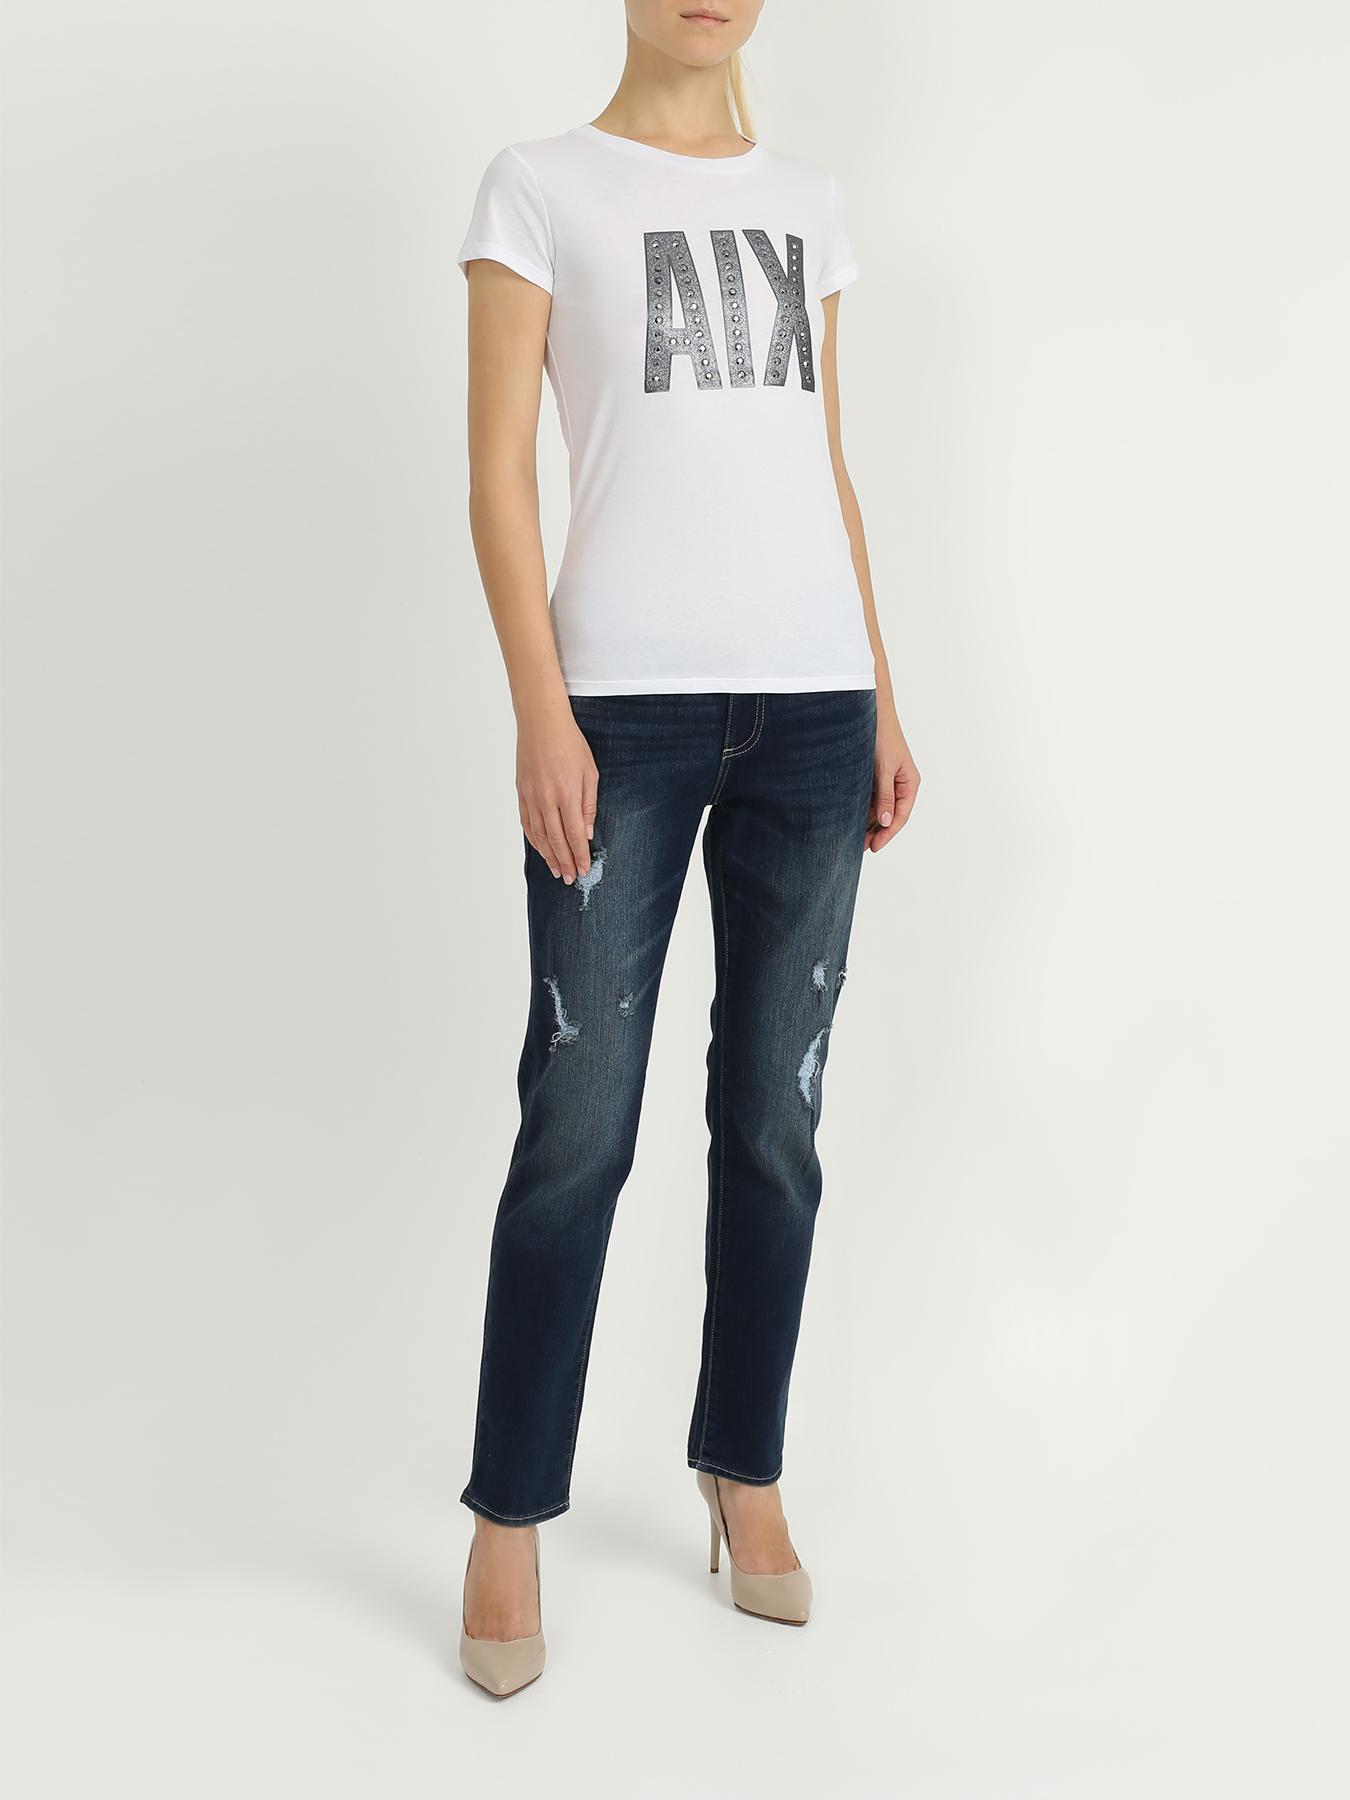 Armani Exchange Потертые джинсы J44 от Armani Exchange